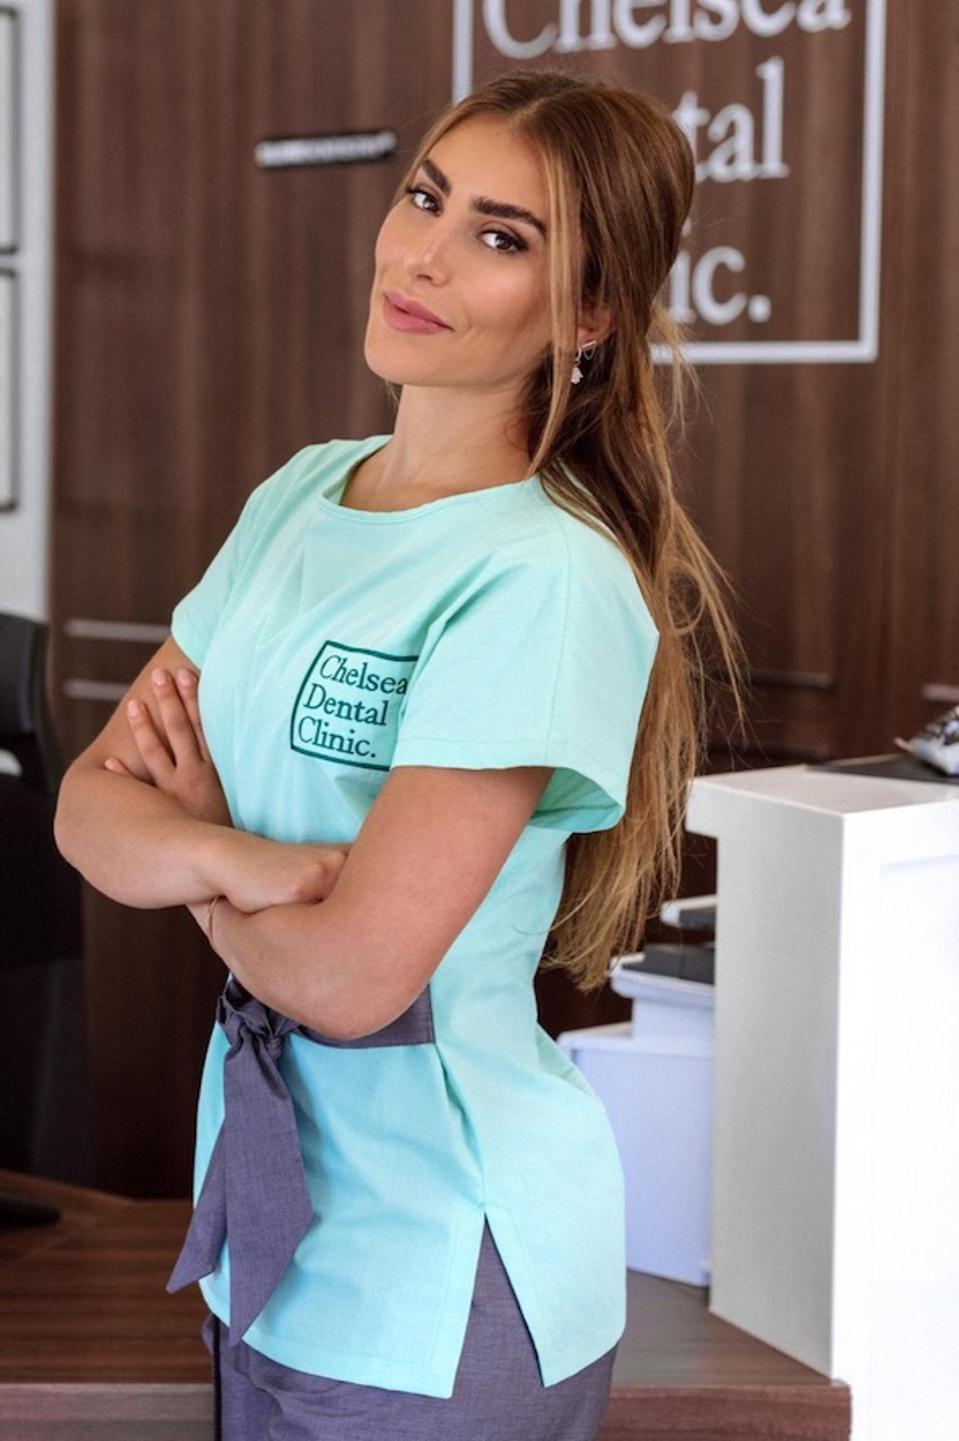 Dr Rhona Eskander, Chelsea Dental